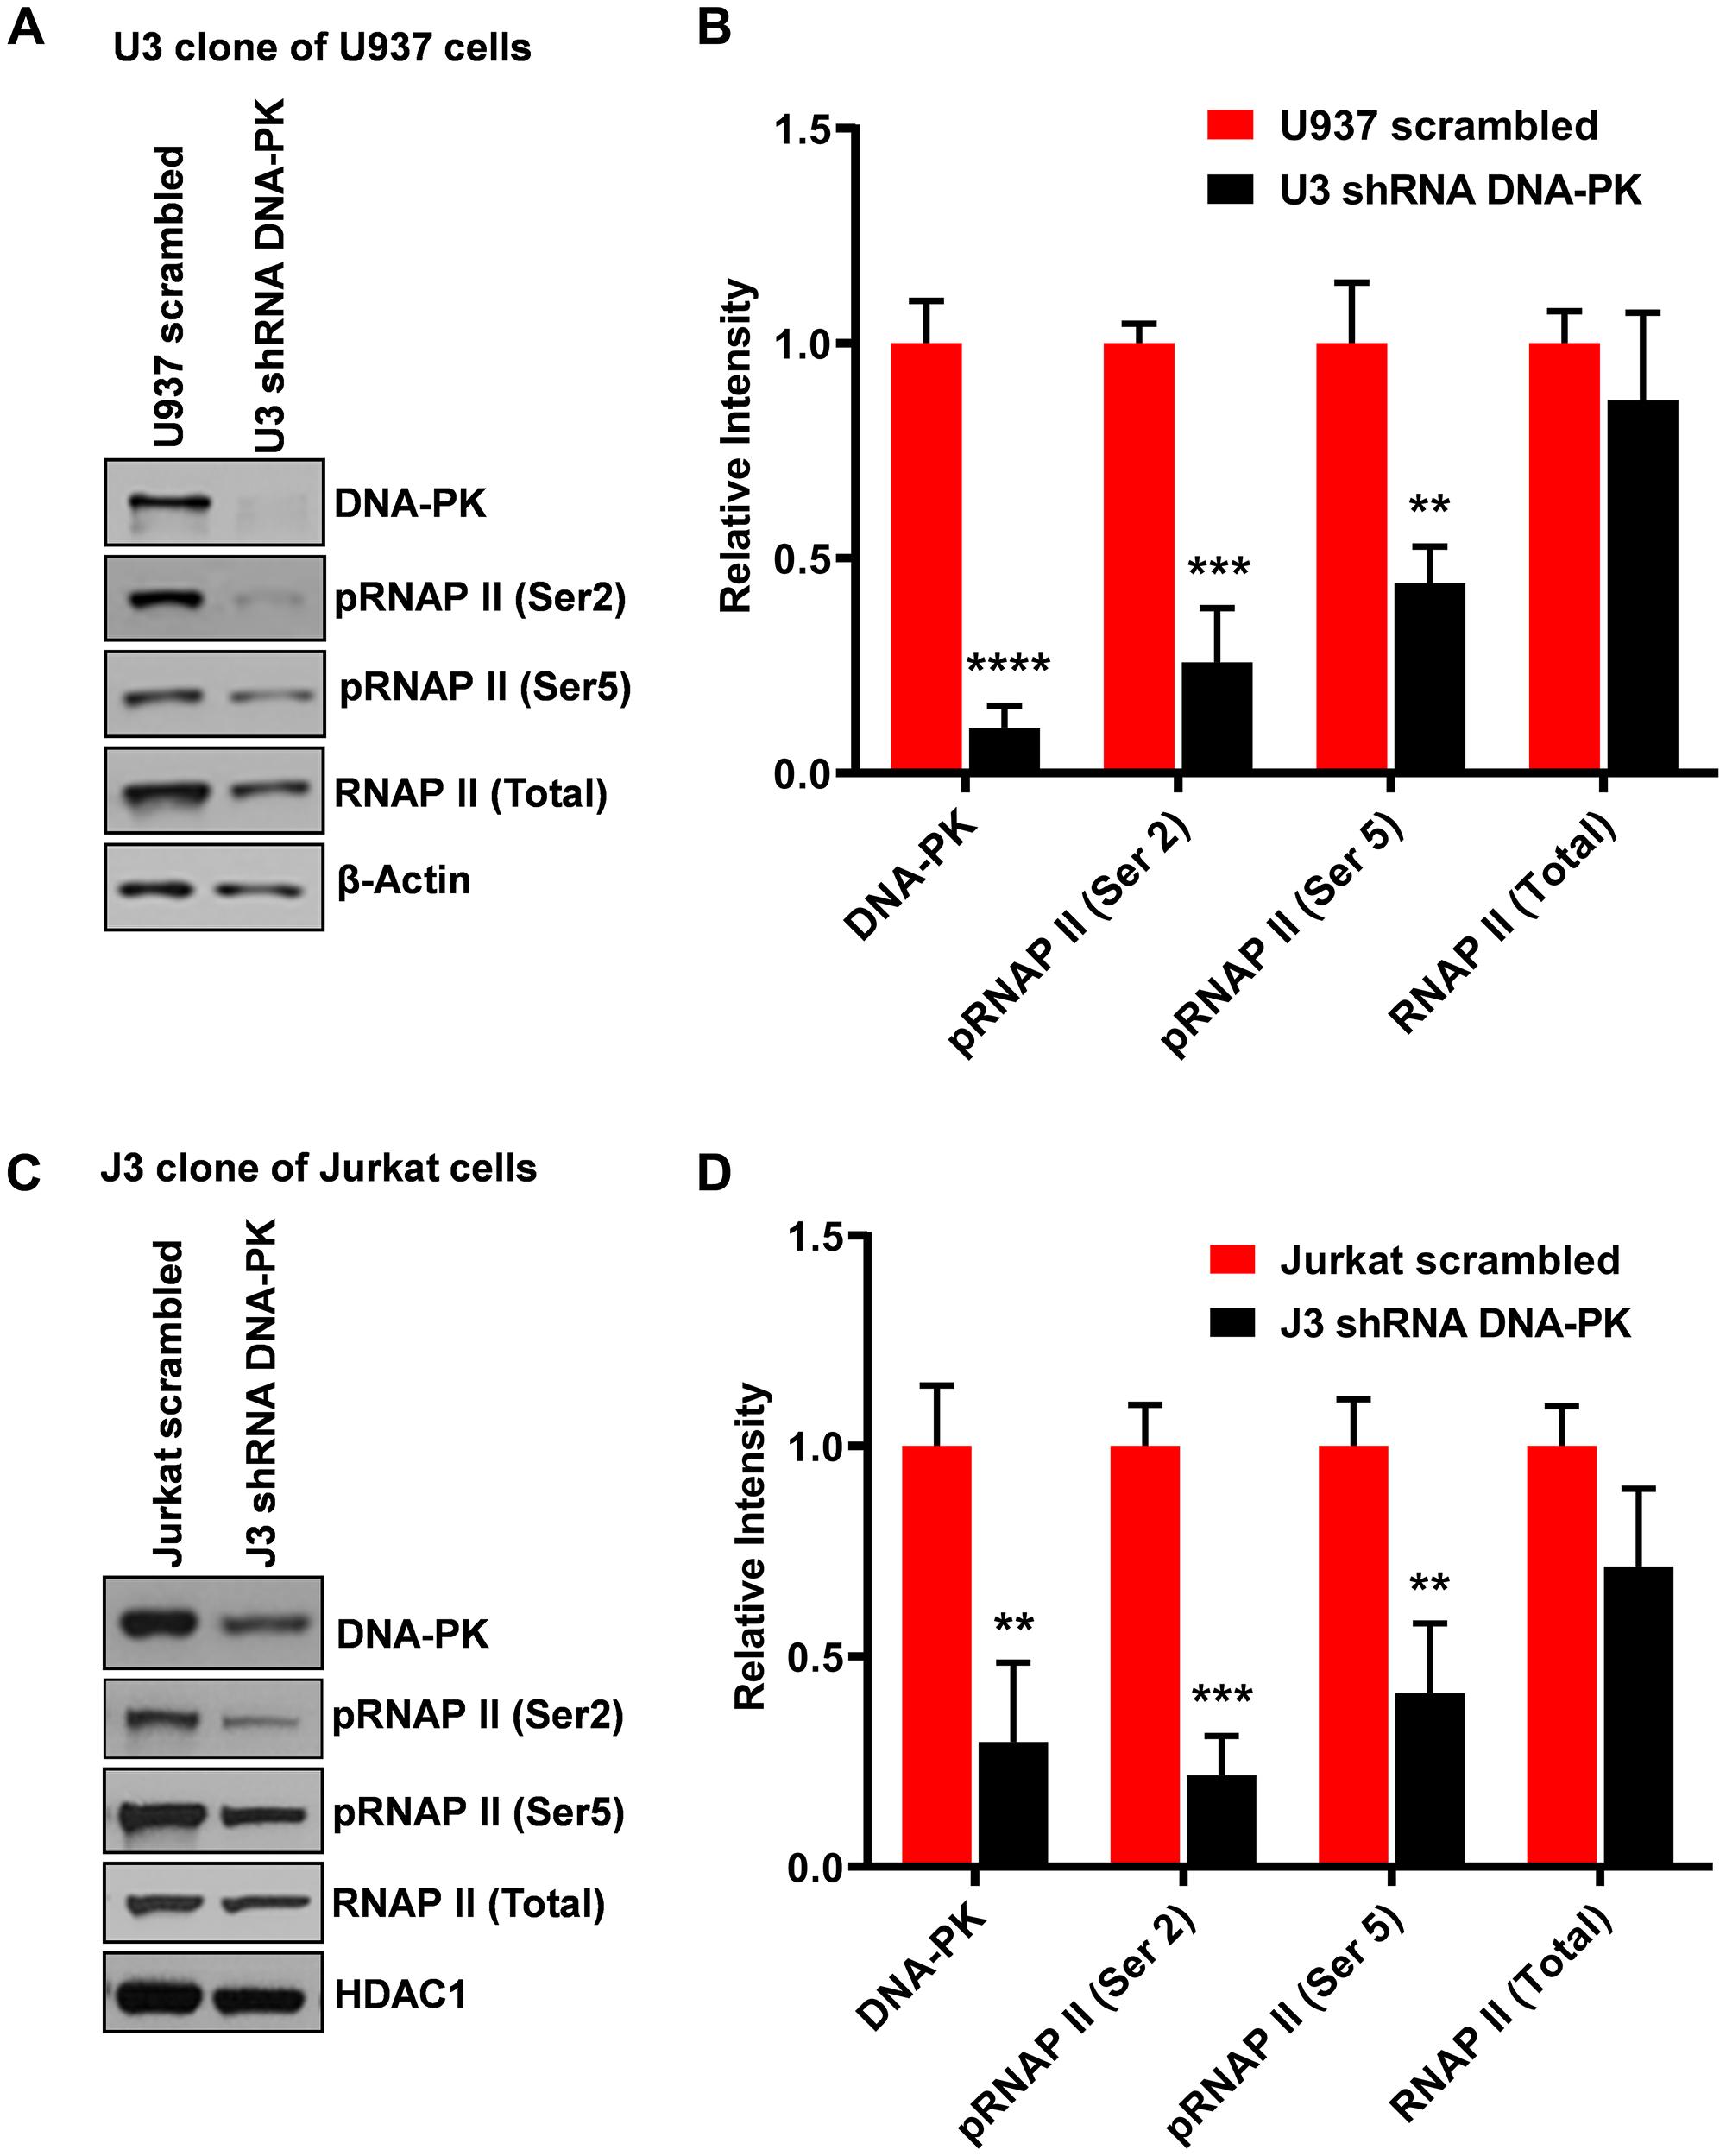 Knockdown of DNA-PK restricts RNAP II CTD phosphorylation.